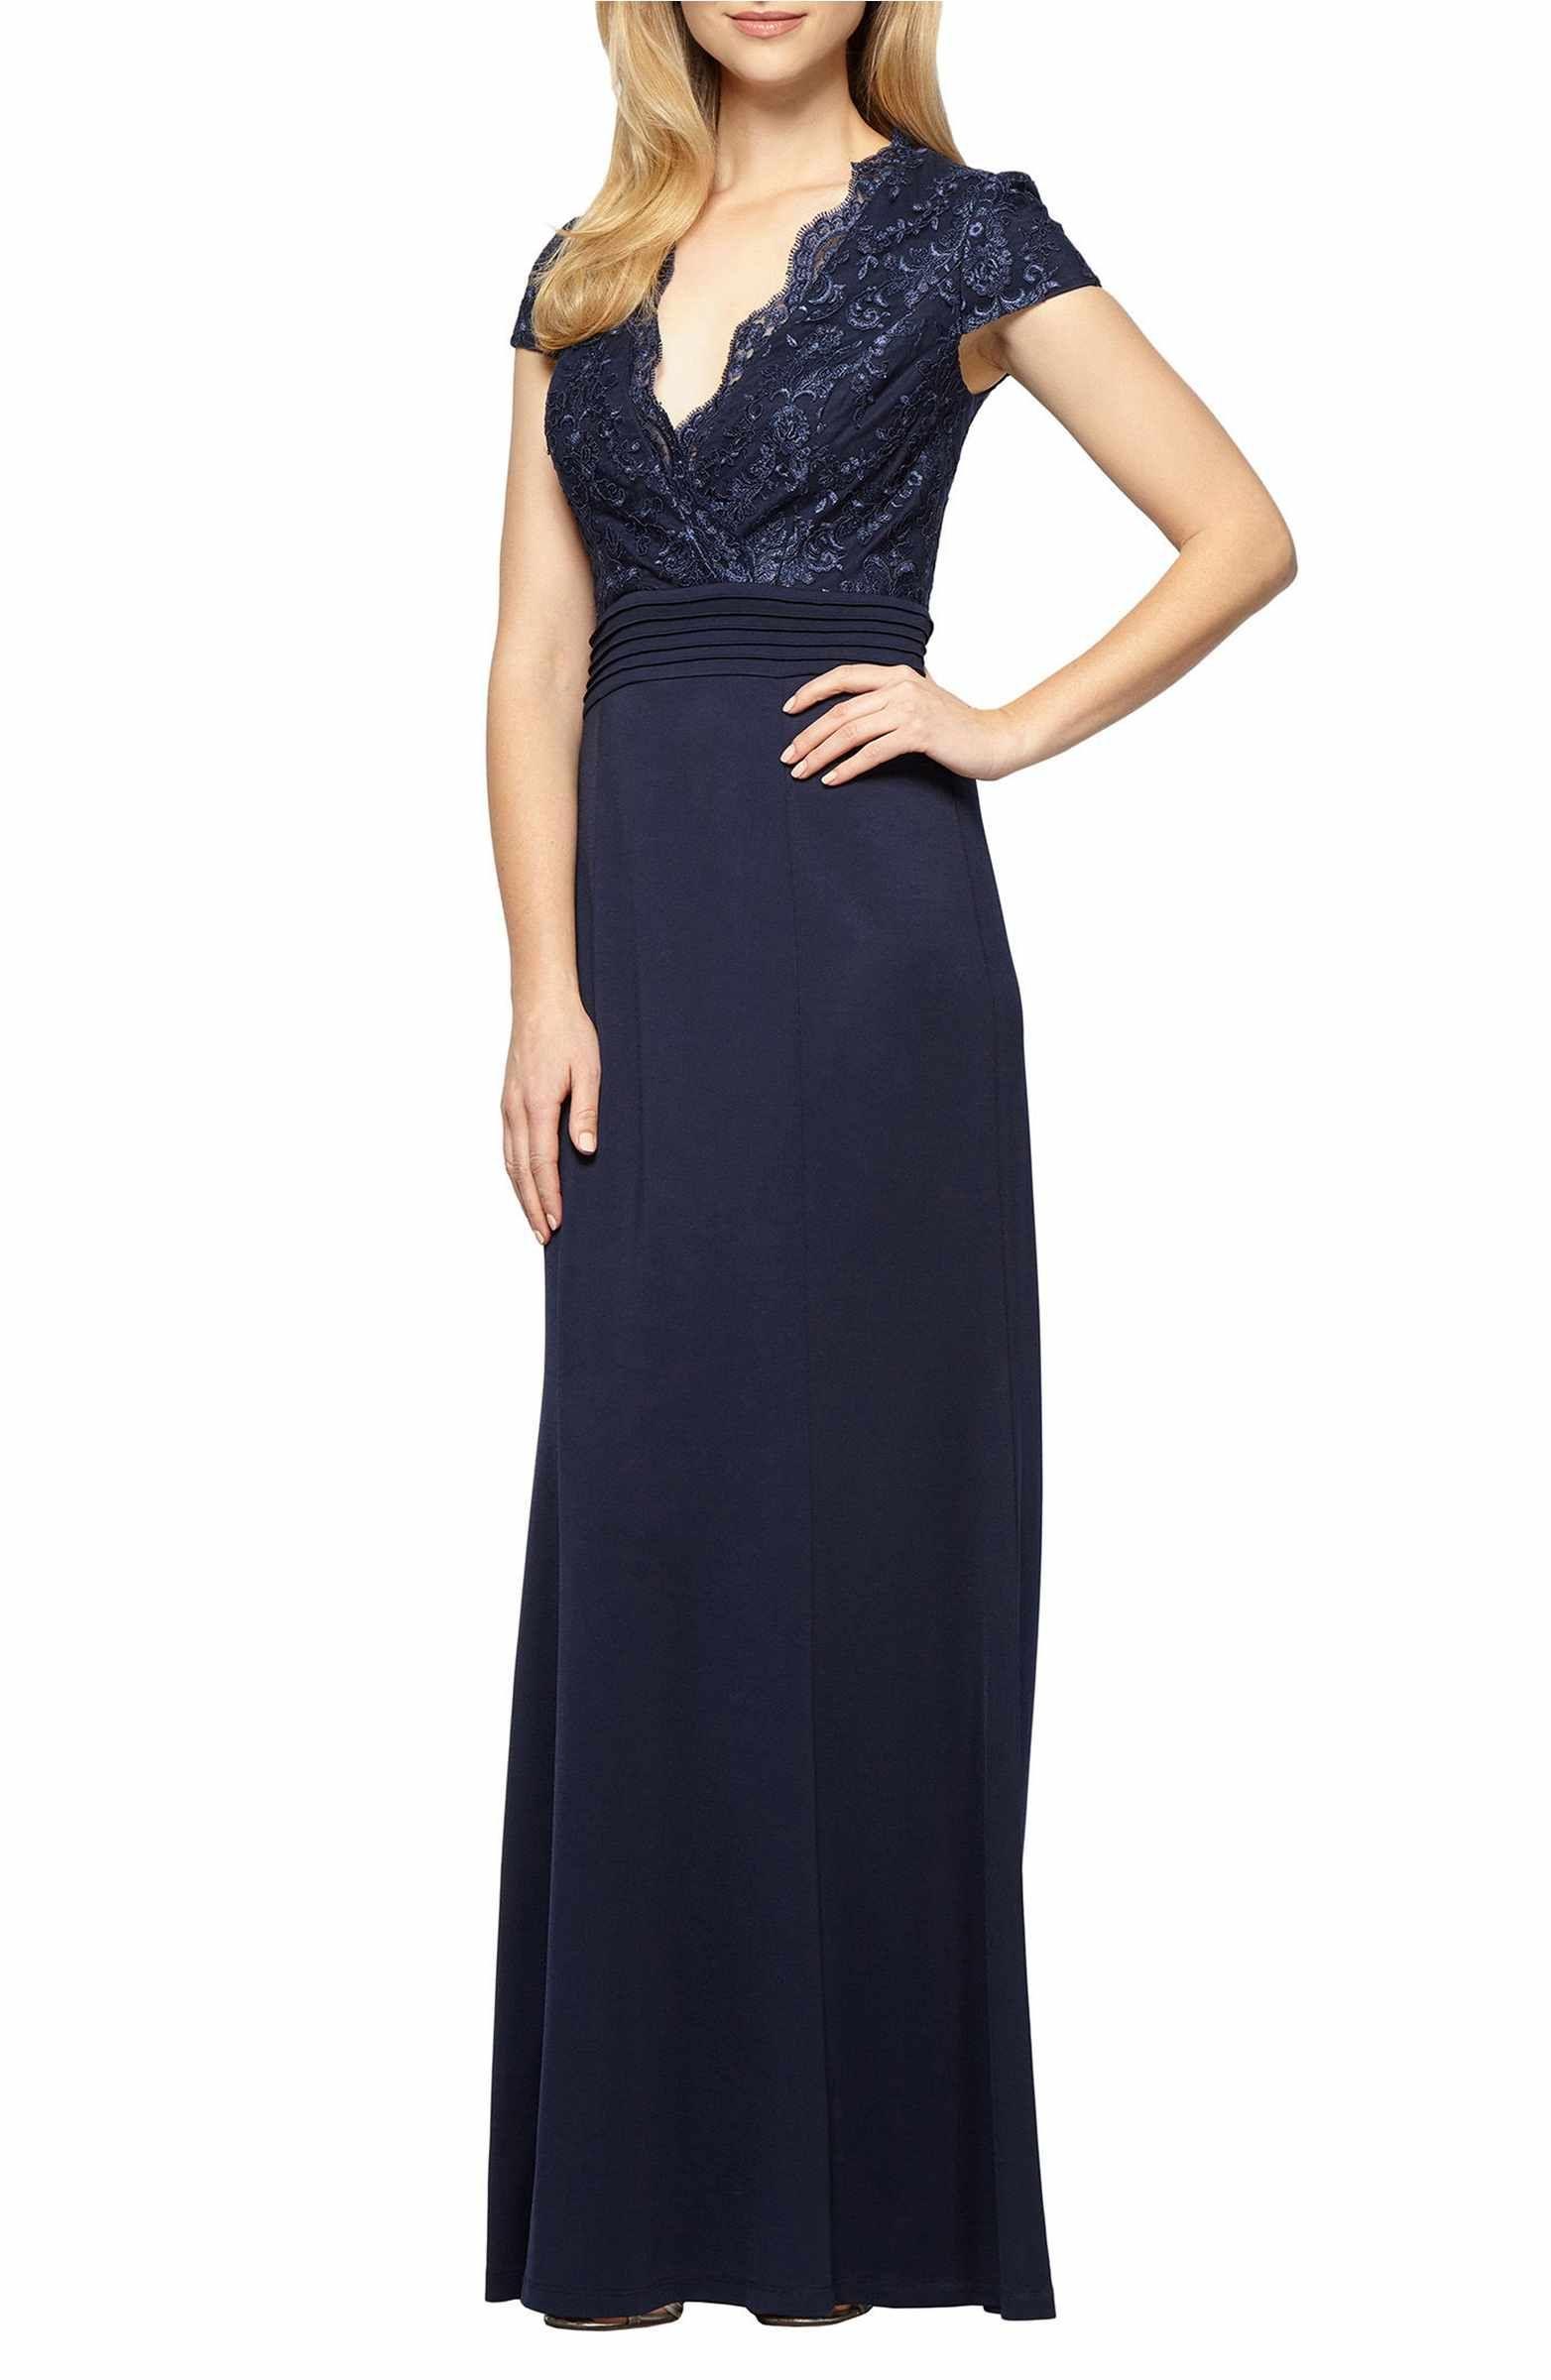 Main image alex evenings lace u jersey aline gown dresses for